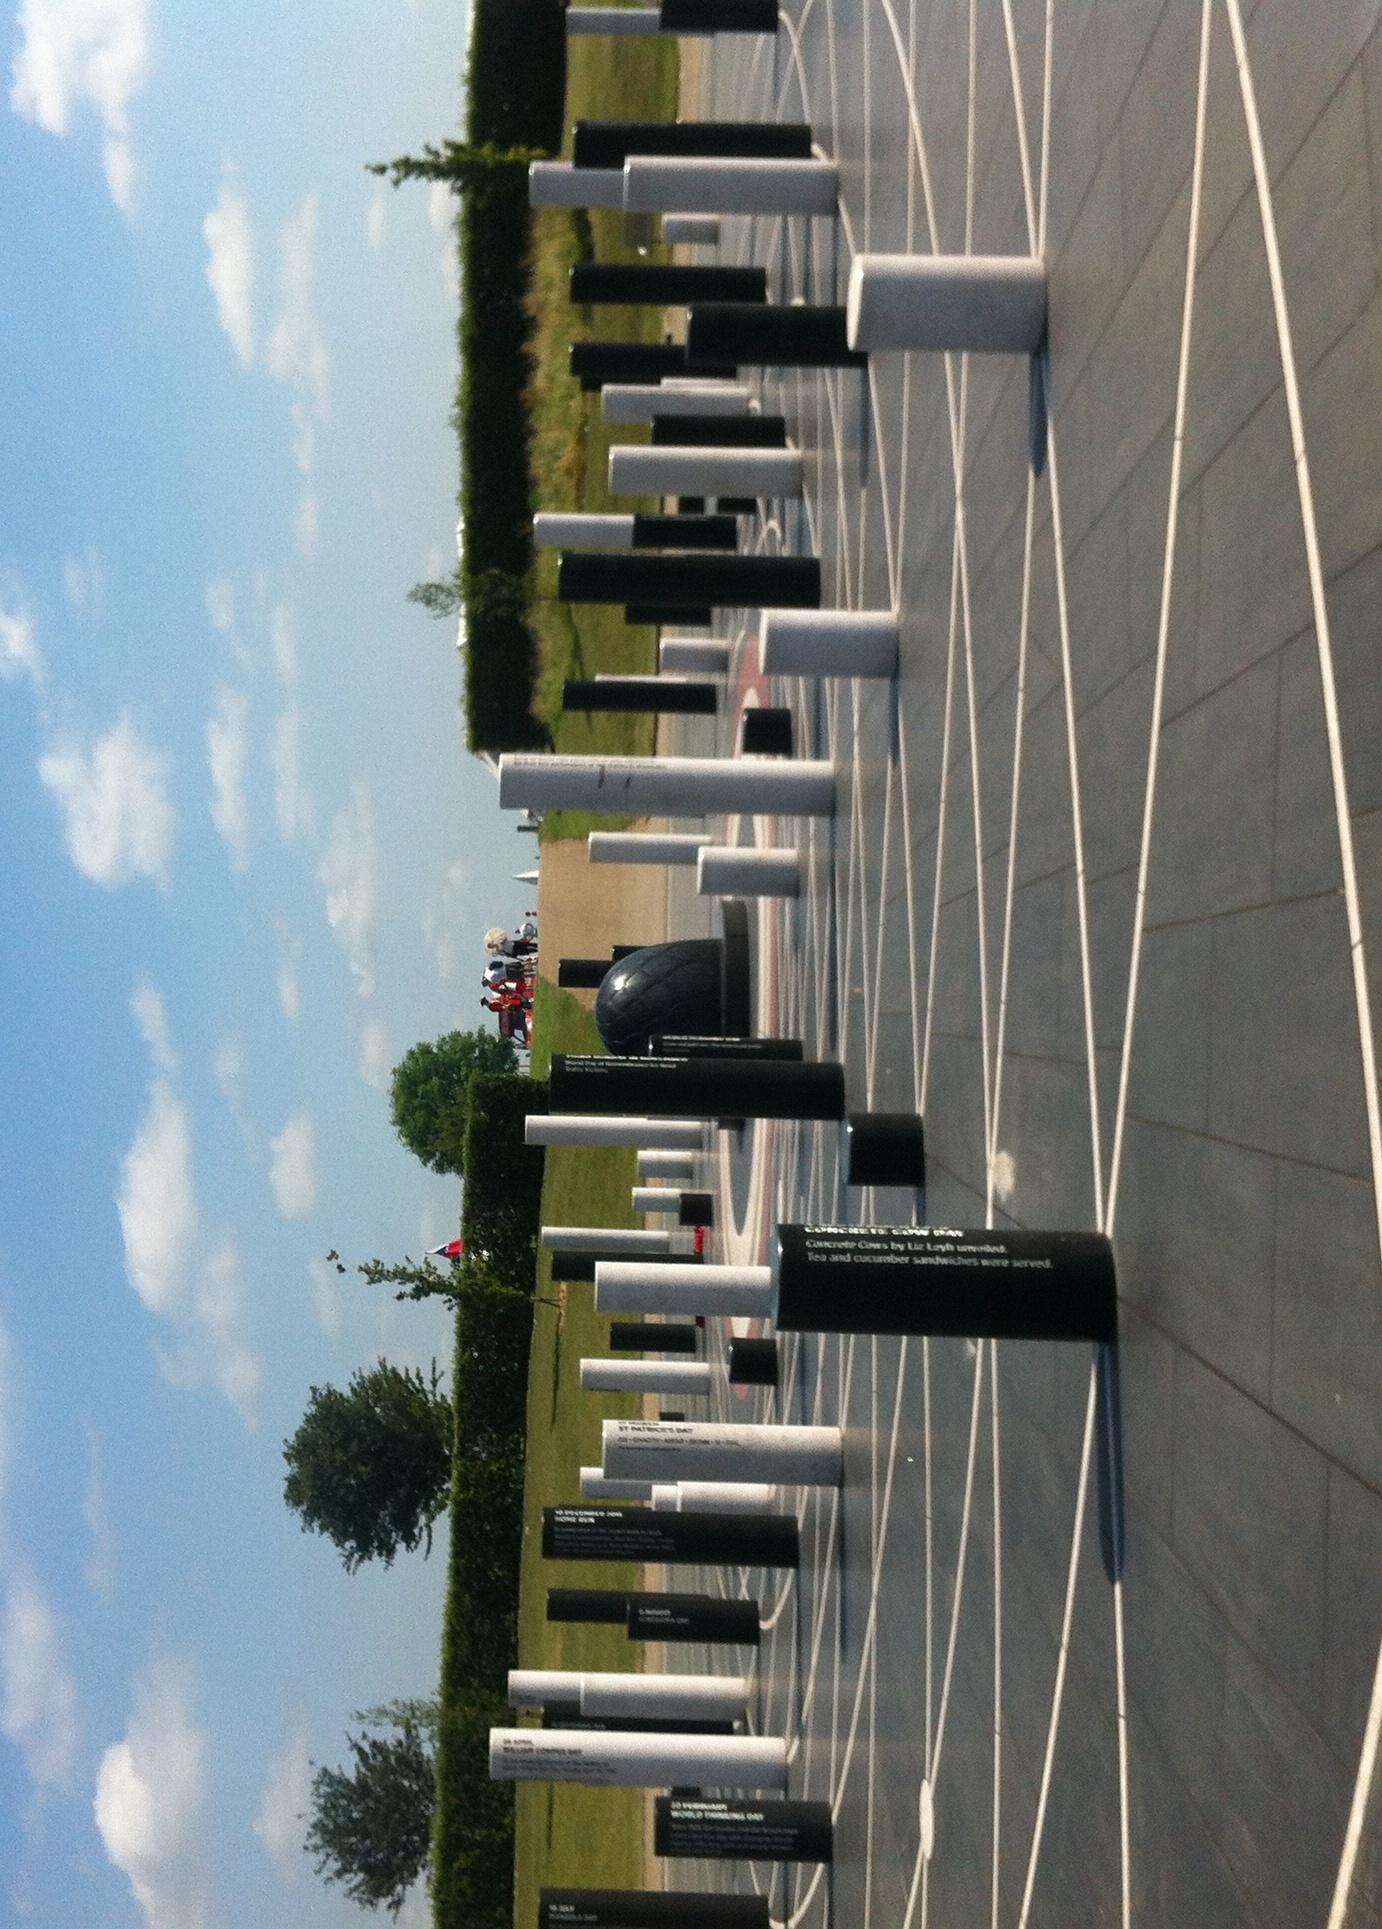 Milton Keynes Rose (Cenotaph Trust)